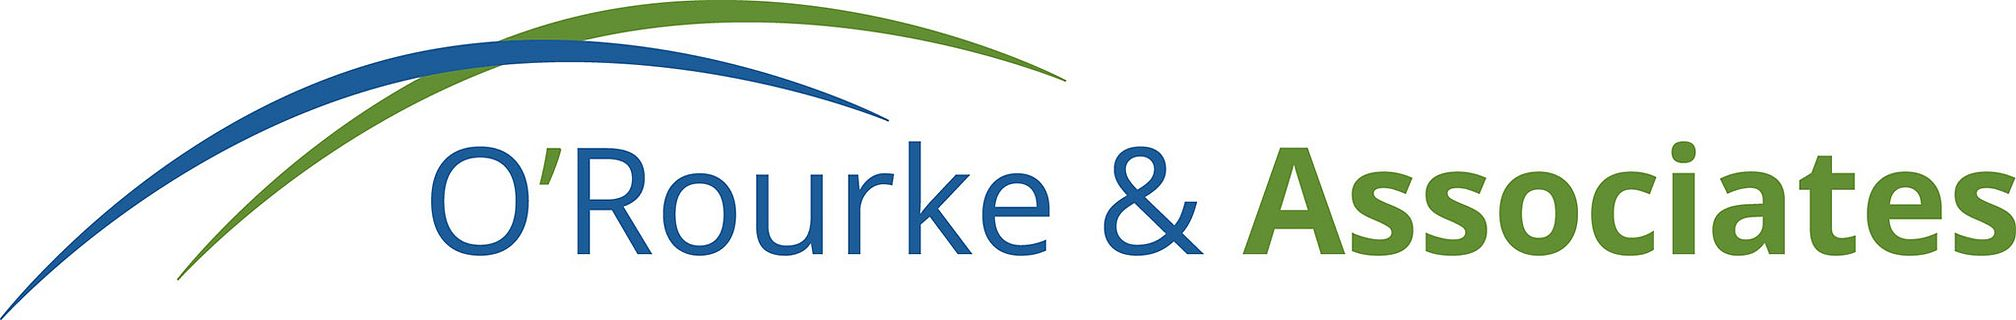 O'Rourke and Associates